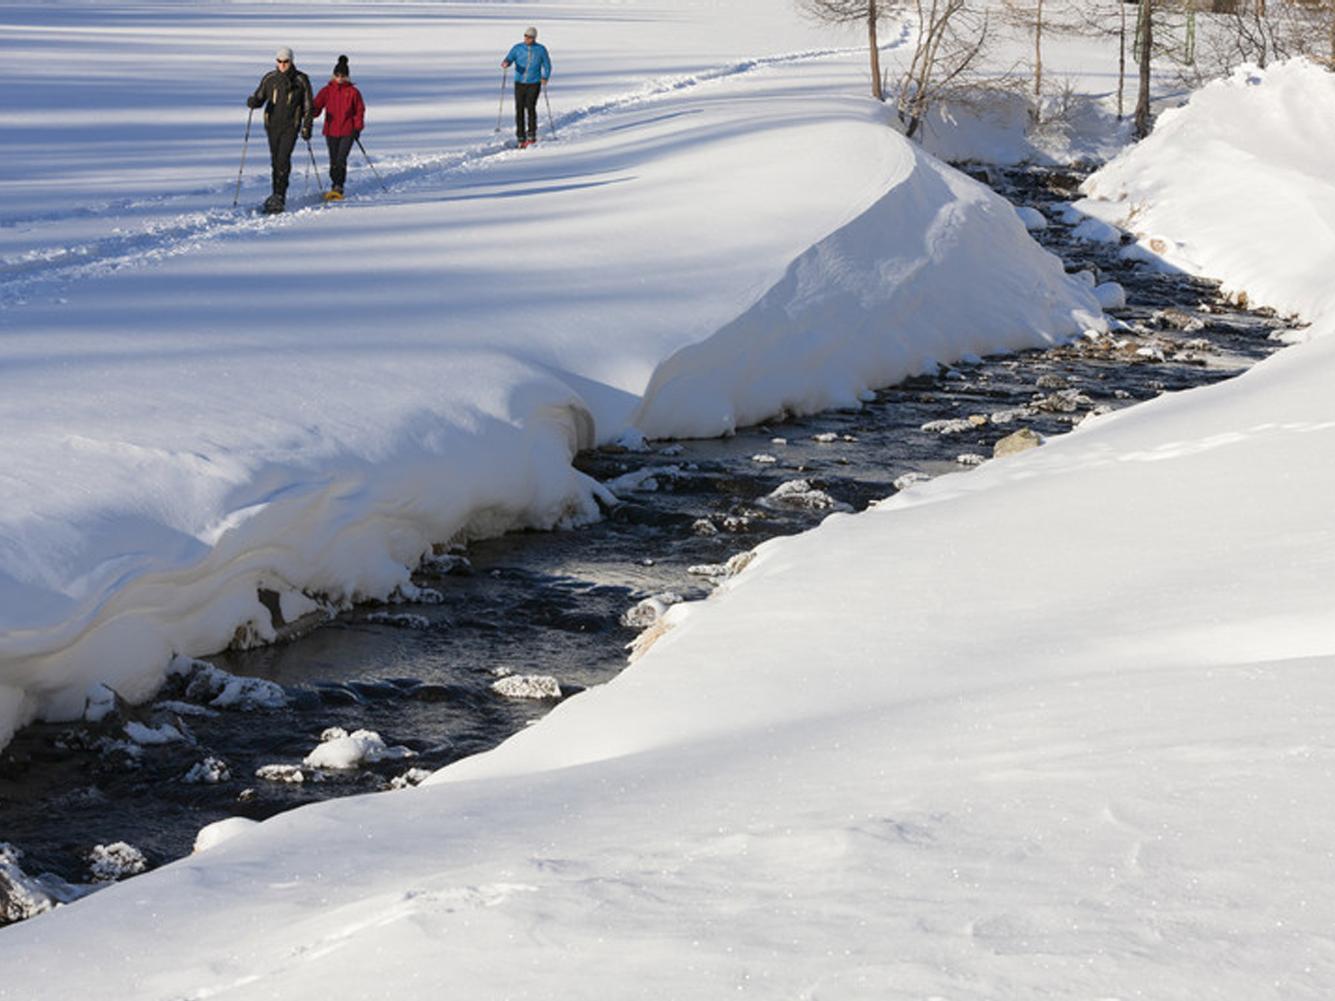 Schneeschuhwanderung zur Larcherberger Säge